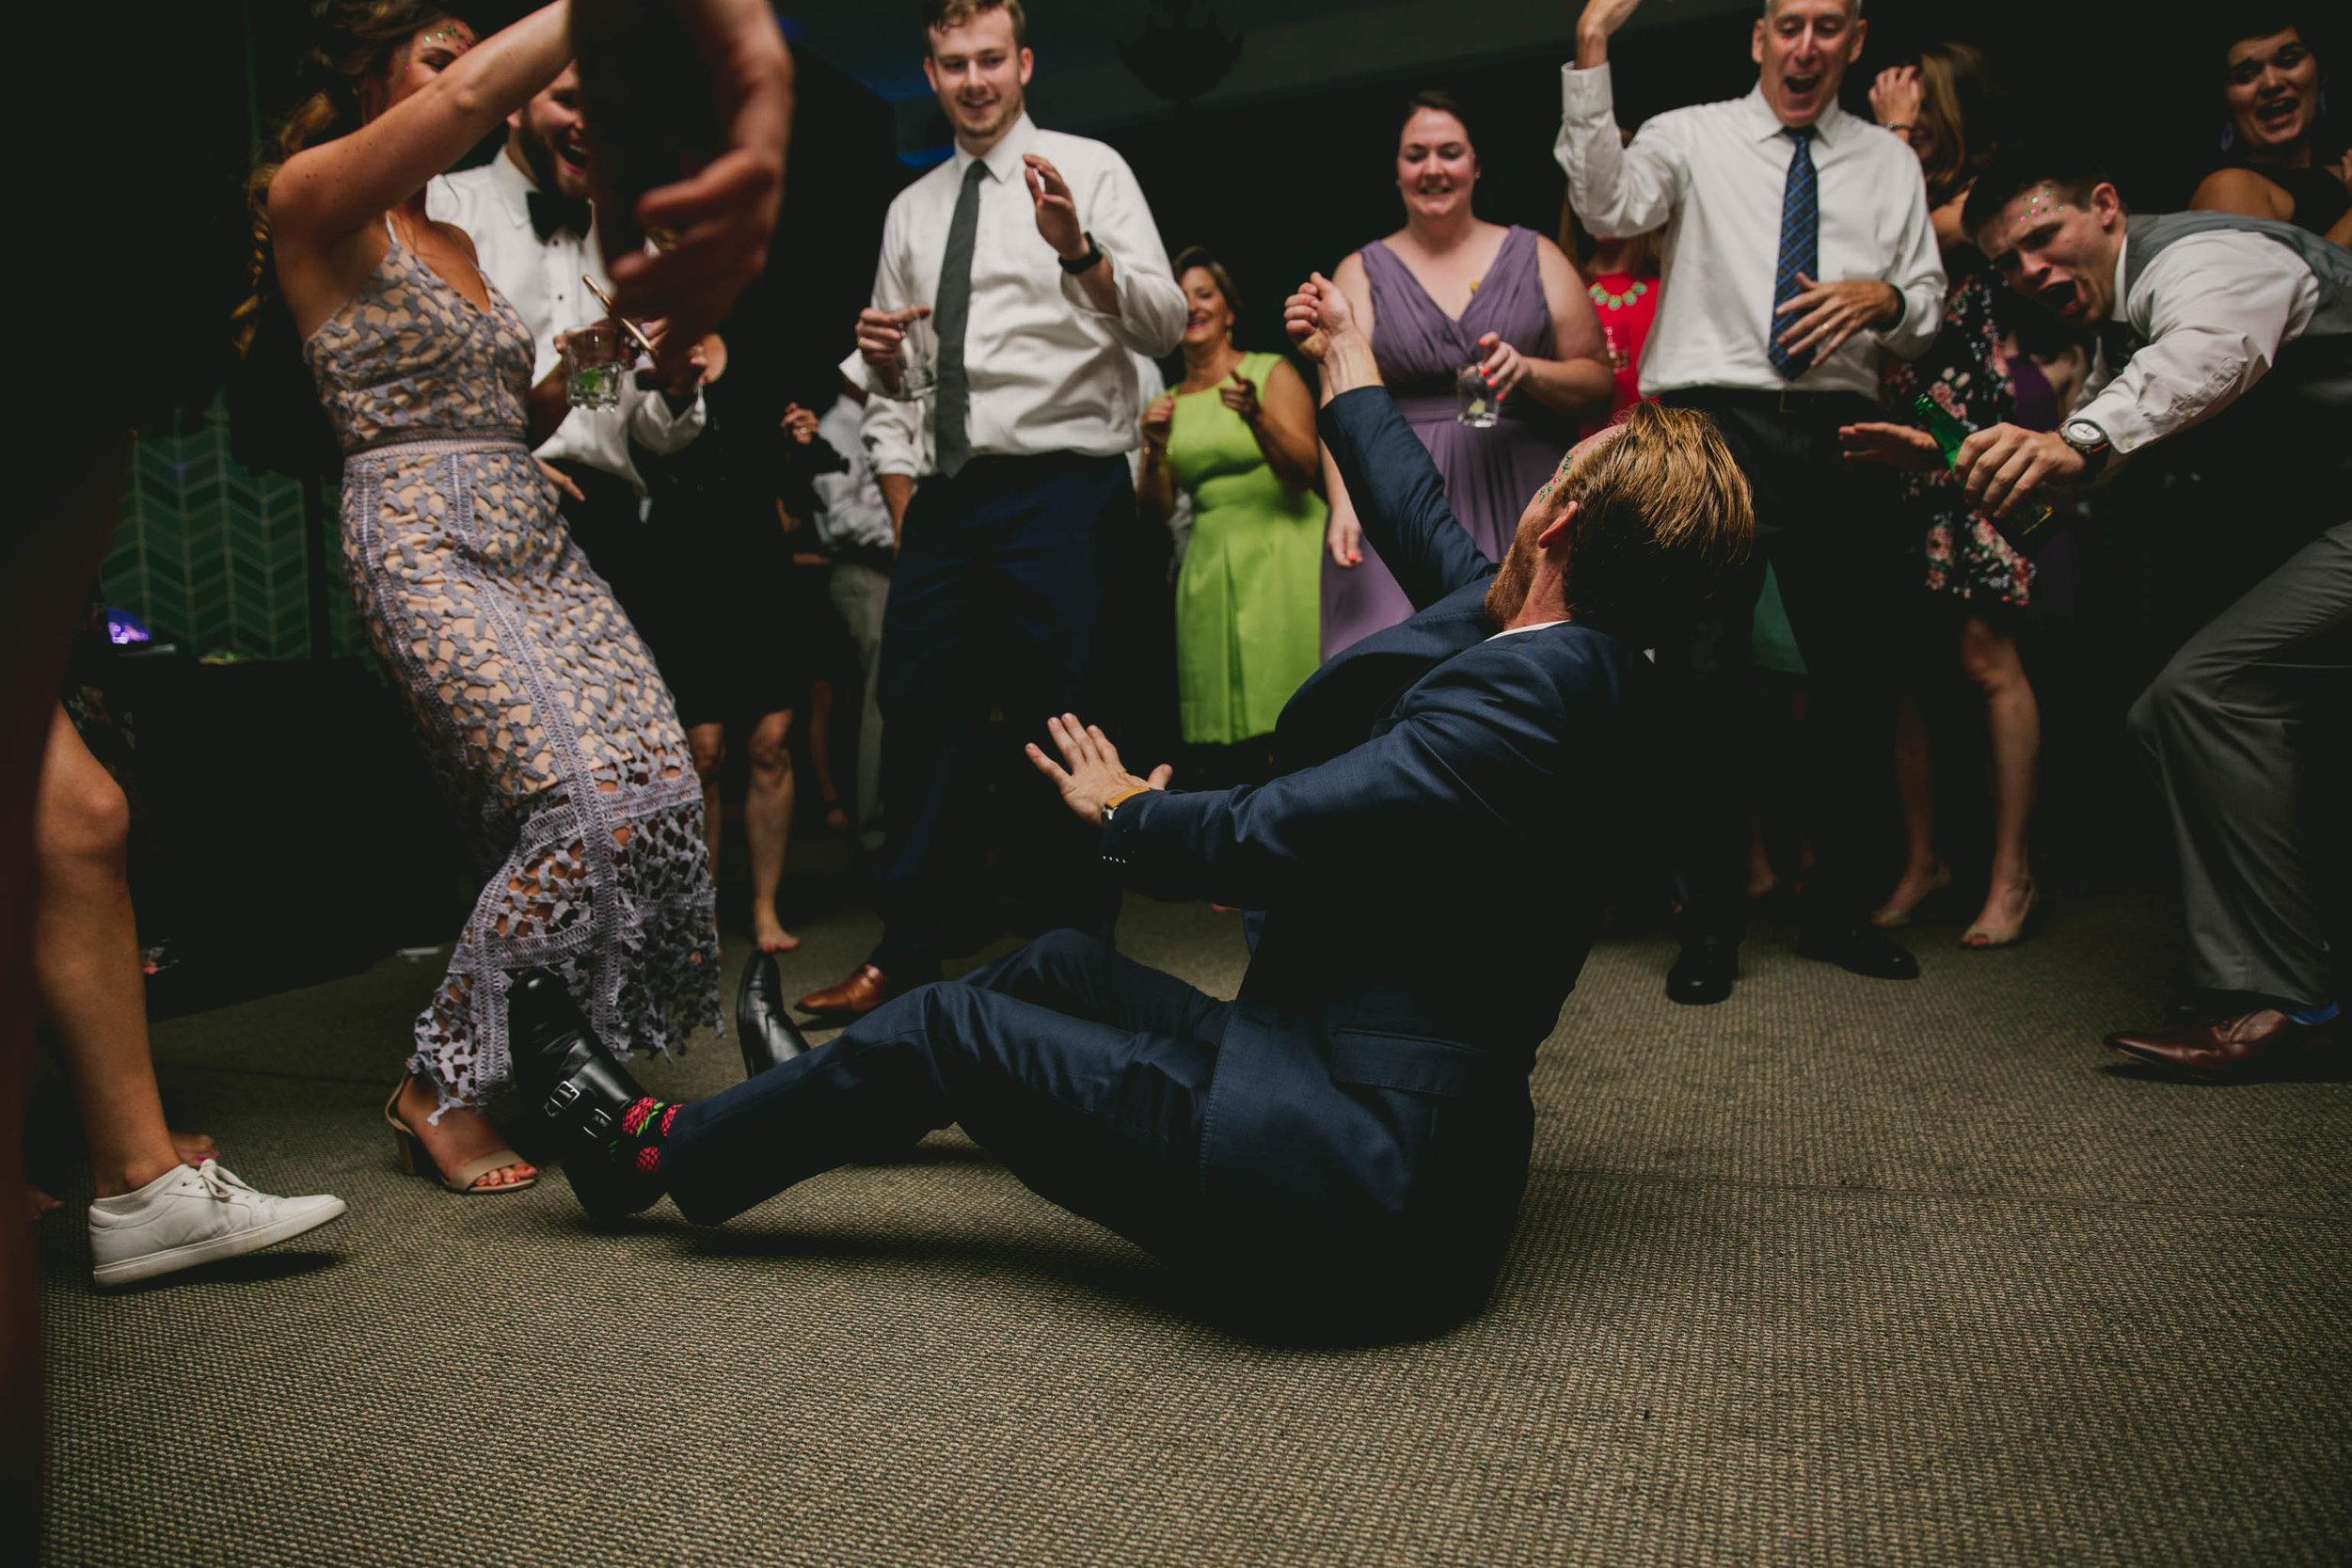 crazy-fun-wedding-reception-photo-at-the-graylyn.jpg